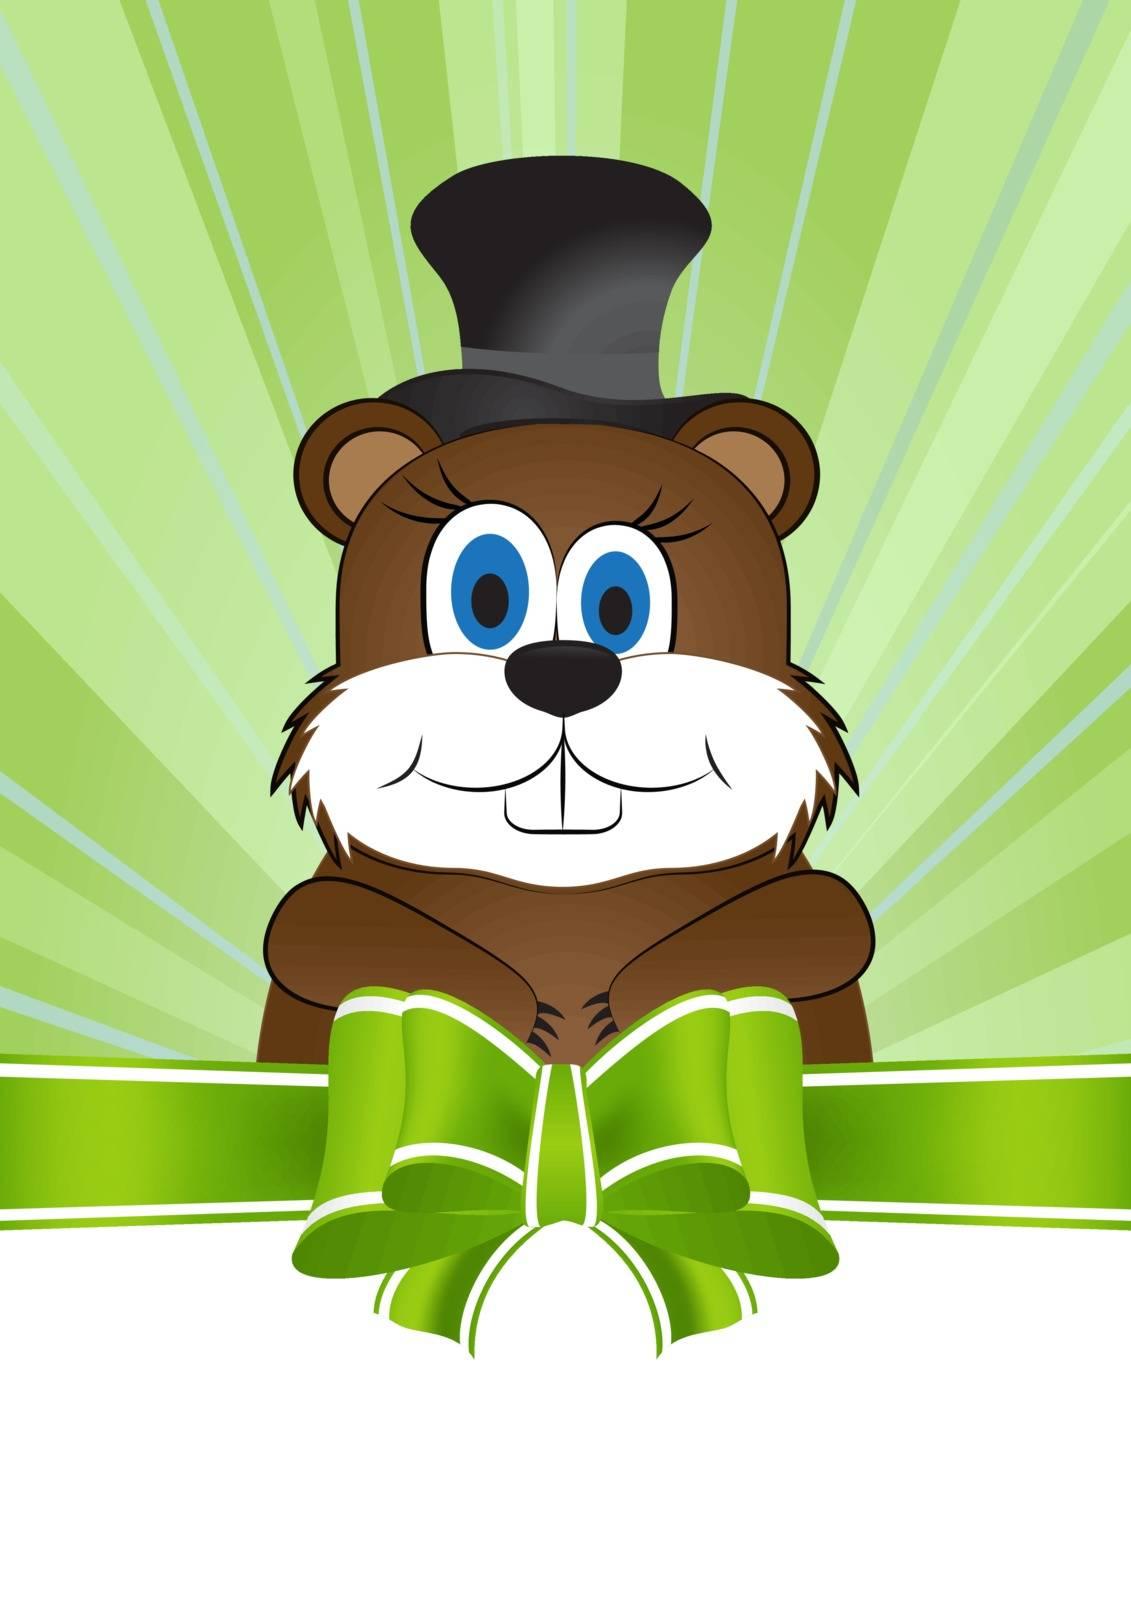 greeting card on Groundhog day with the image of the animal Groundhog